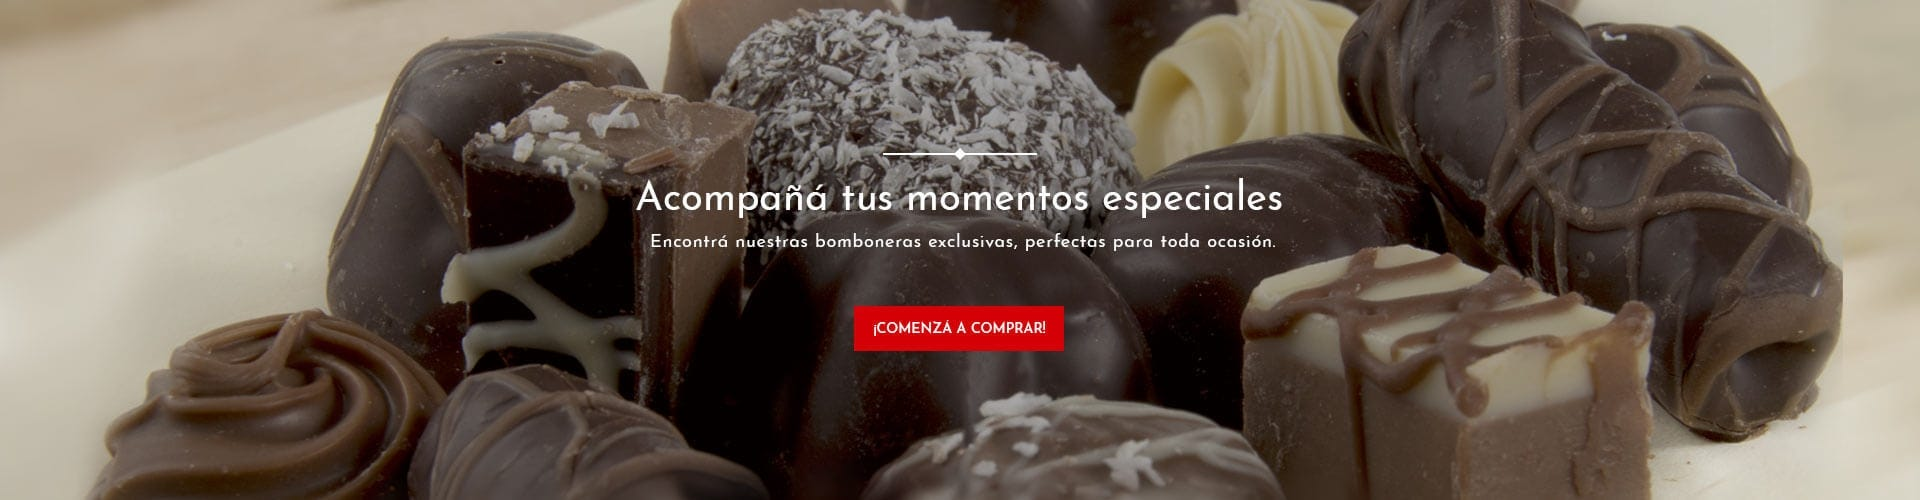 /bombones.html